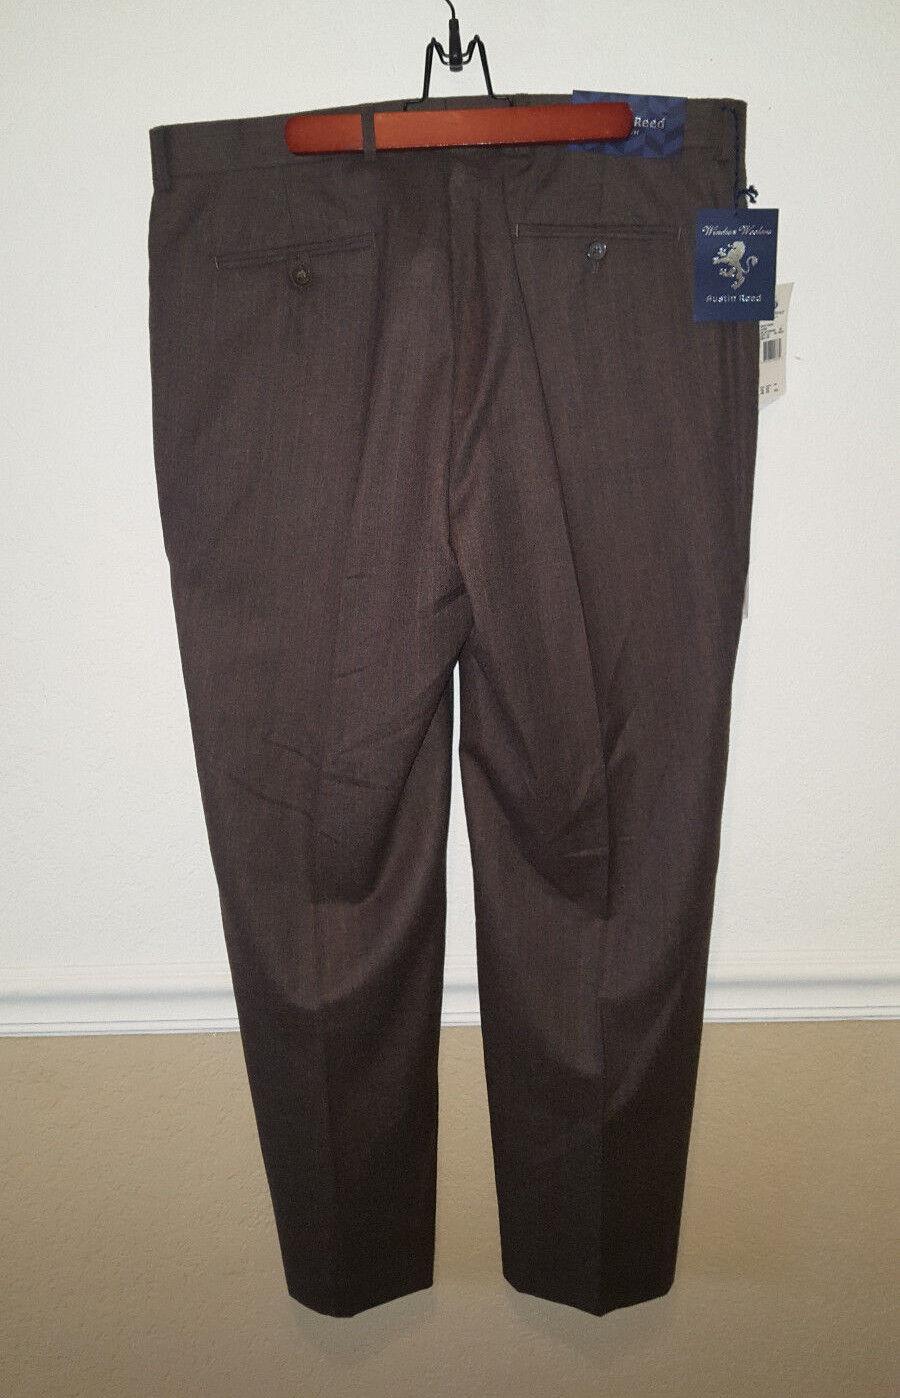 NWT  AUSTIN REED LONDON Dress Pants 100% Wool Size 38X30